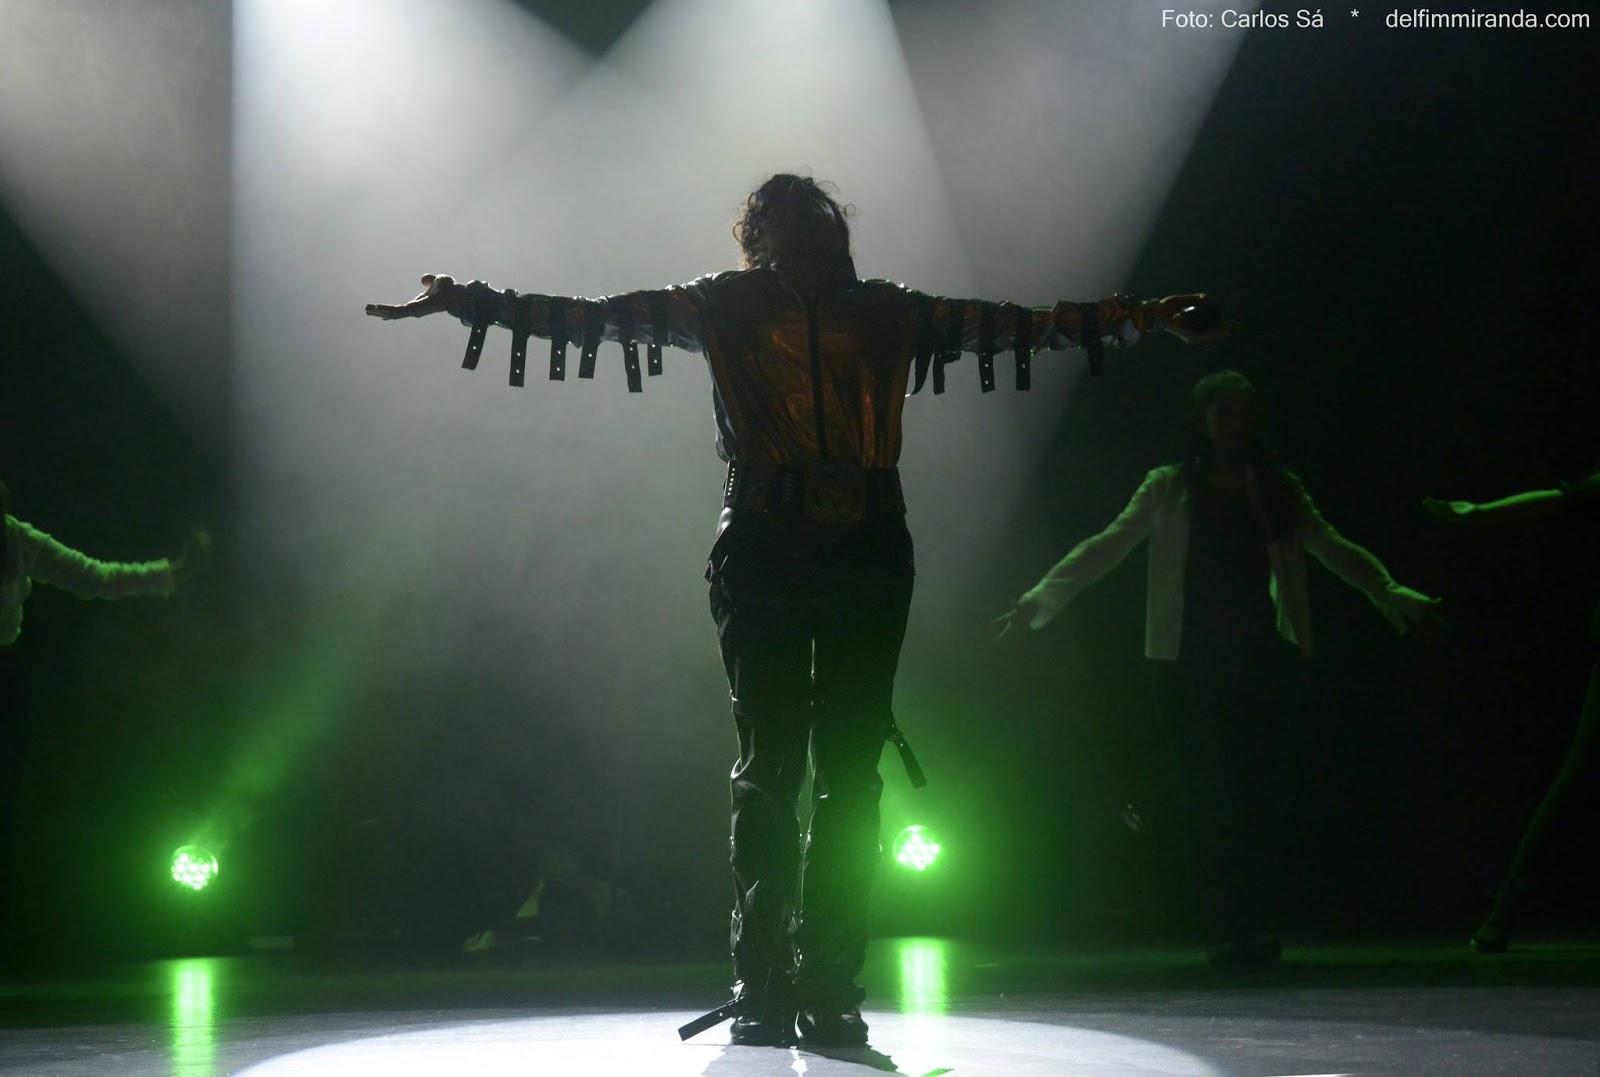 Delfim Miranda - Michael Jackson Tribute - Bad - Final Sequence